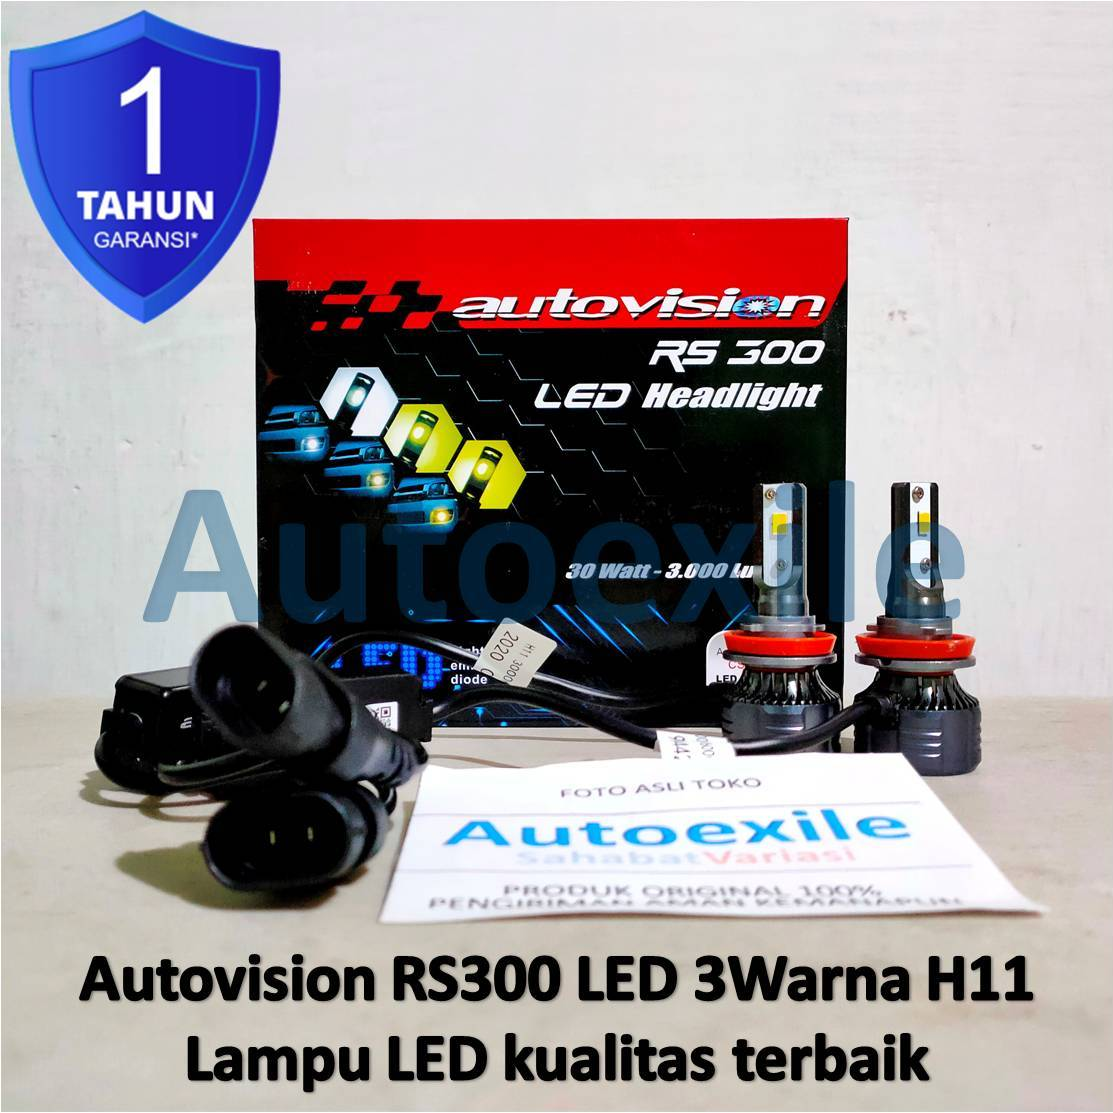 Autovision RS300 LED 3Warna H11 3000K 4300K 6000K Kuning Putih CSP Lampu Mobil Civic Sienta Innova Reborn